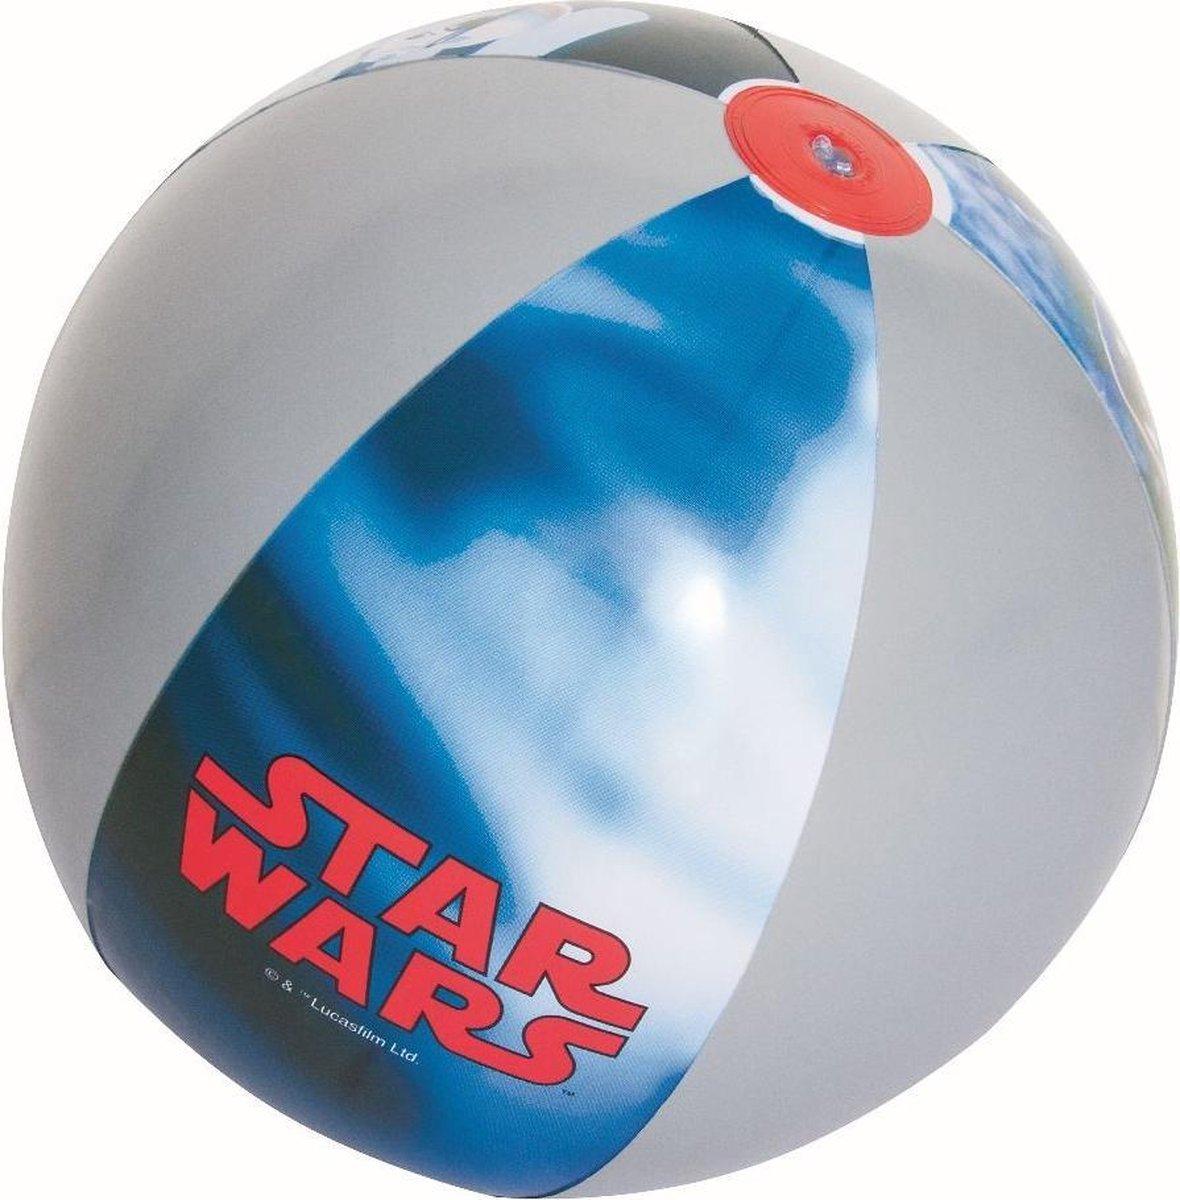 Bestway Strandbal Star Wars 61 Cm Blauw/grijs